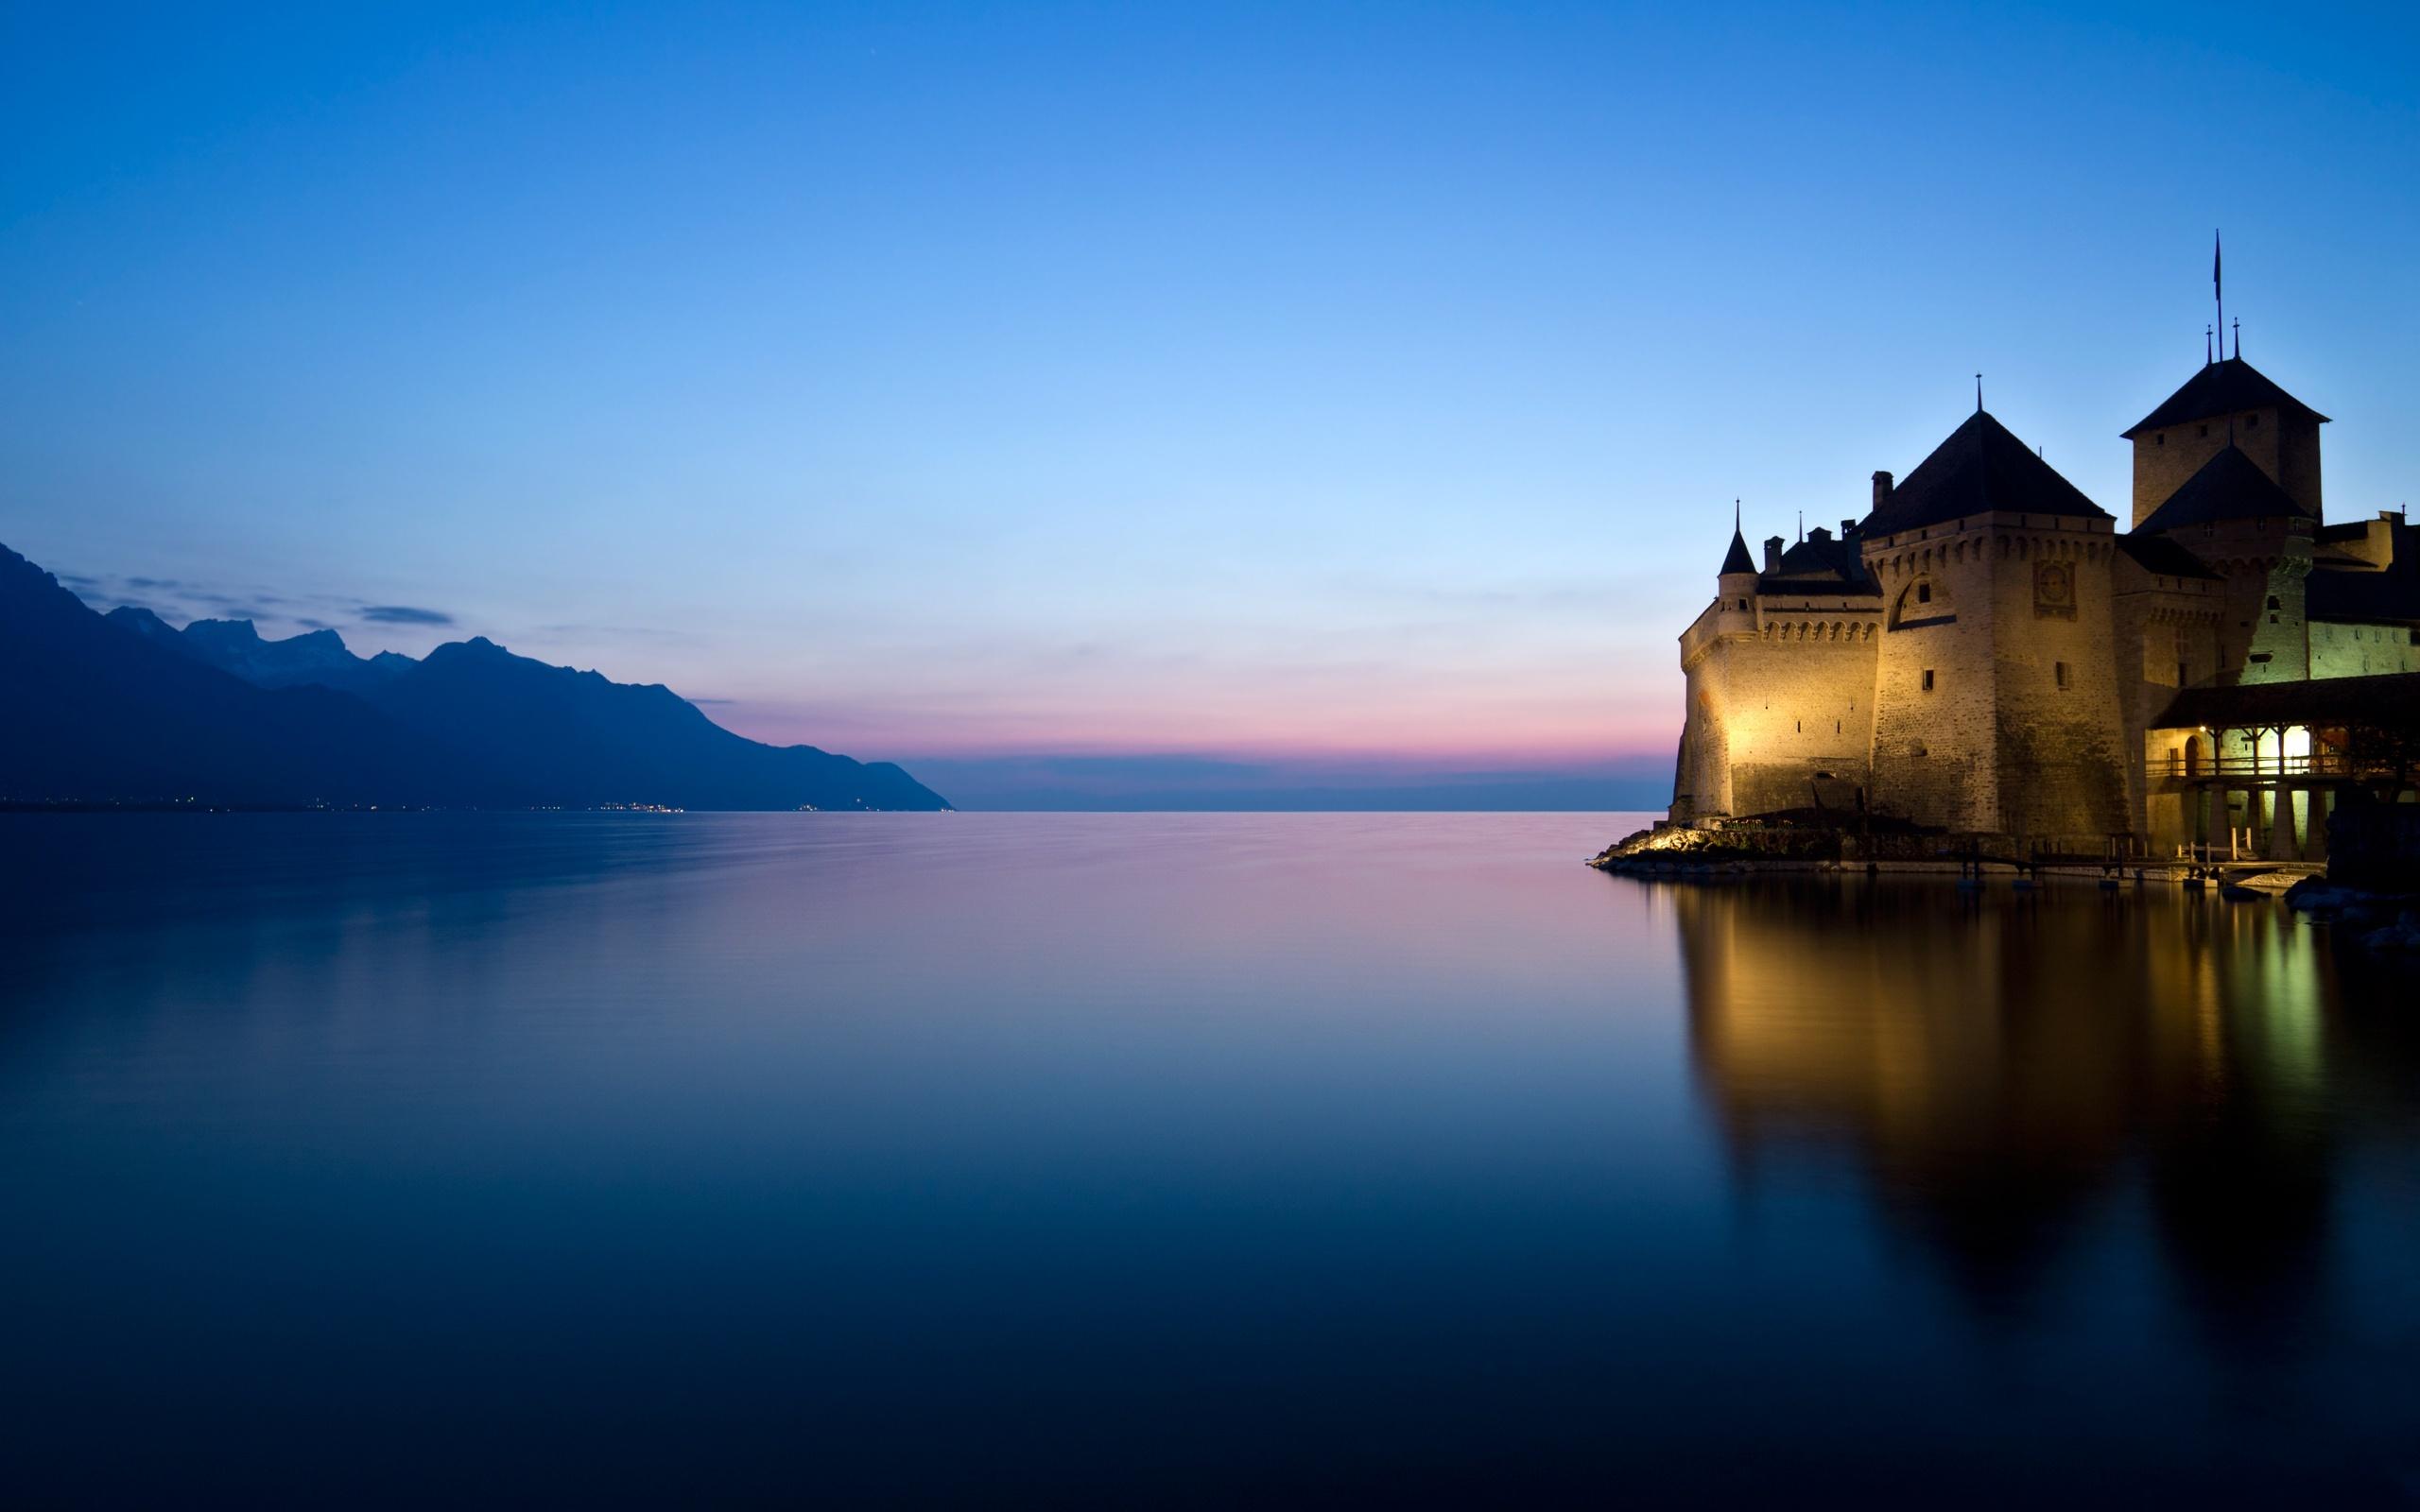 замок на воде  № 158399 без смс